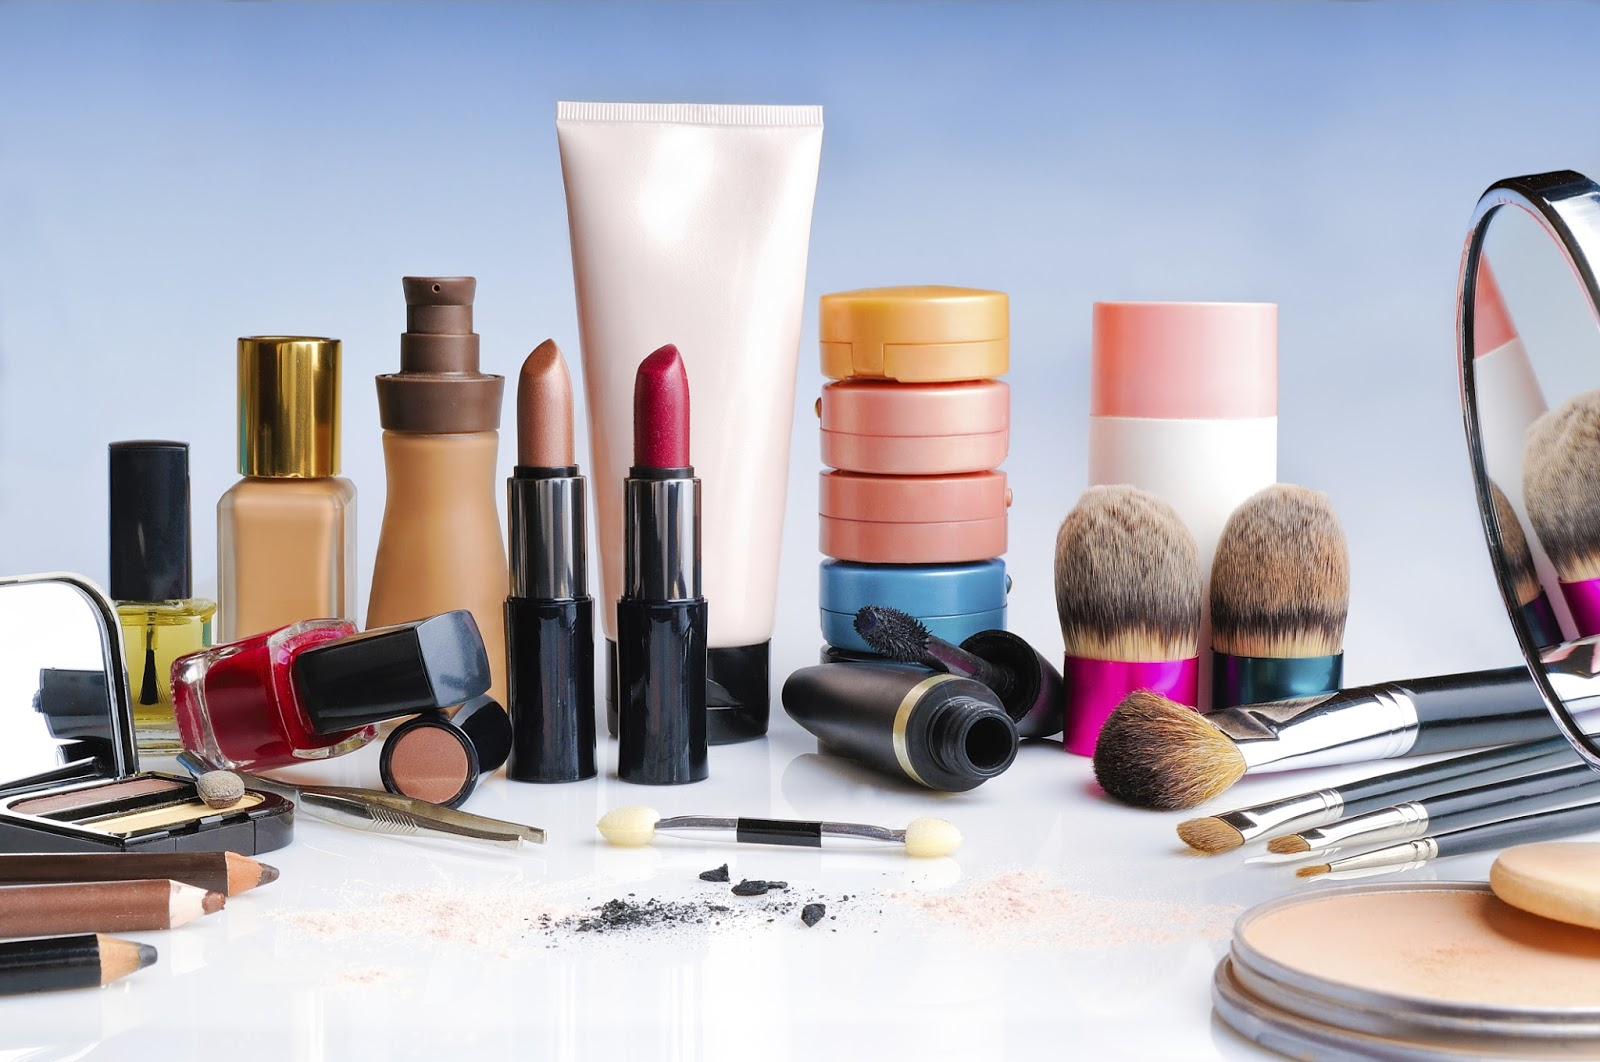 Buying Cosmetics Online - Choose Premium Cosmetics Only 2017